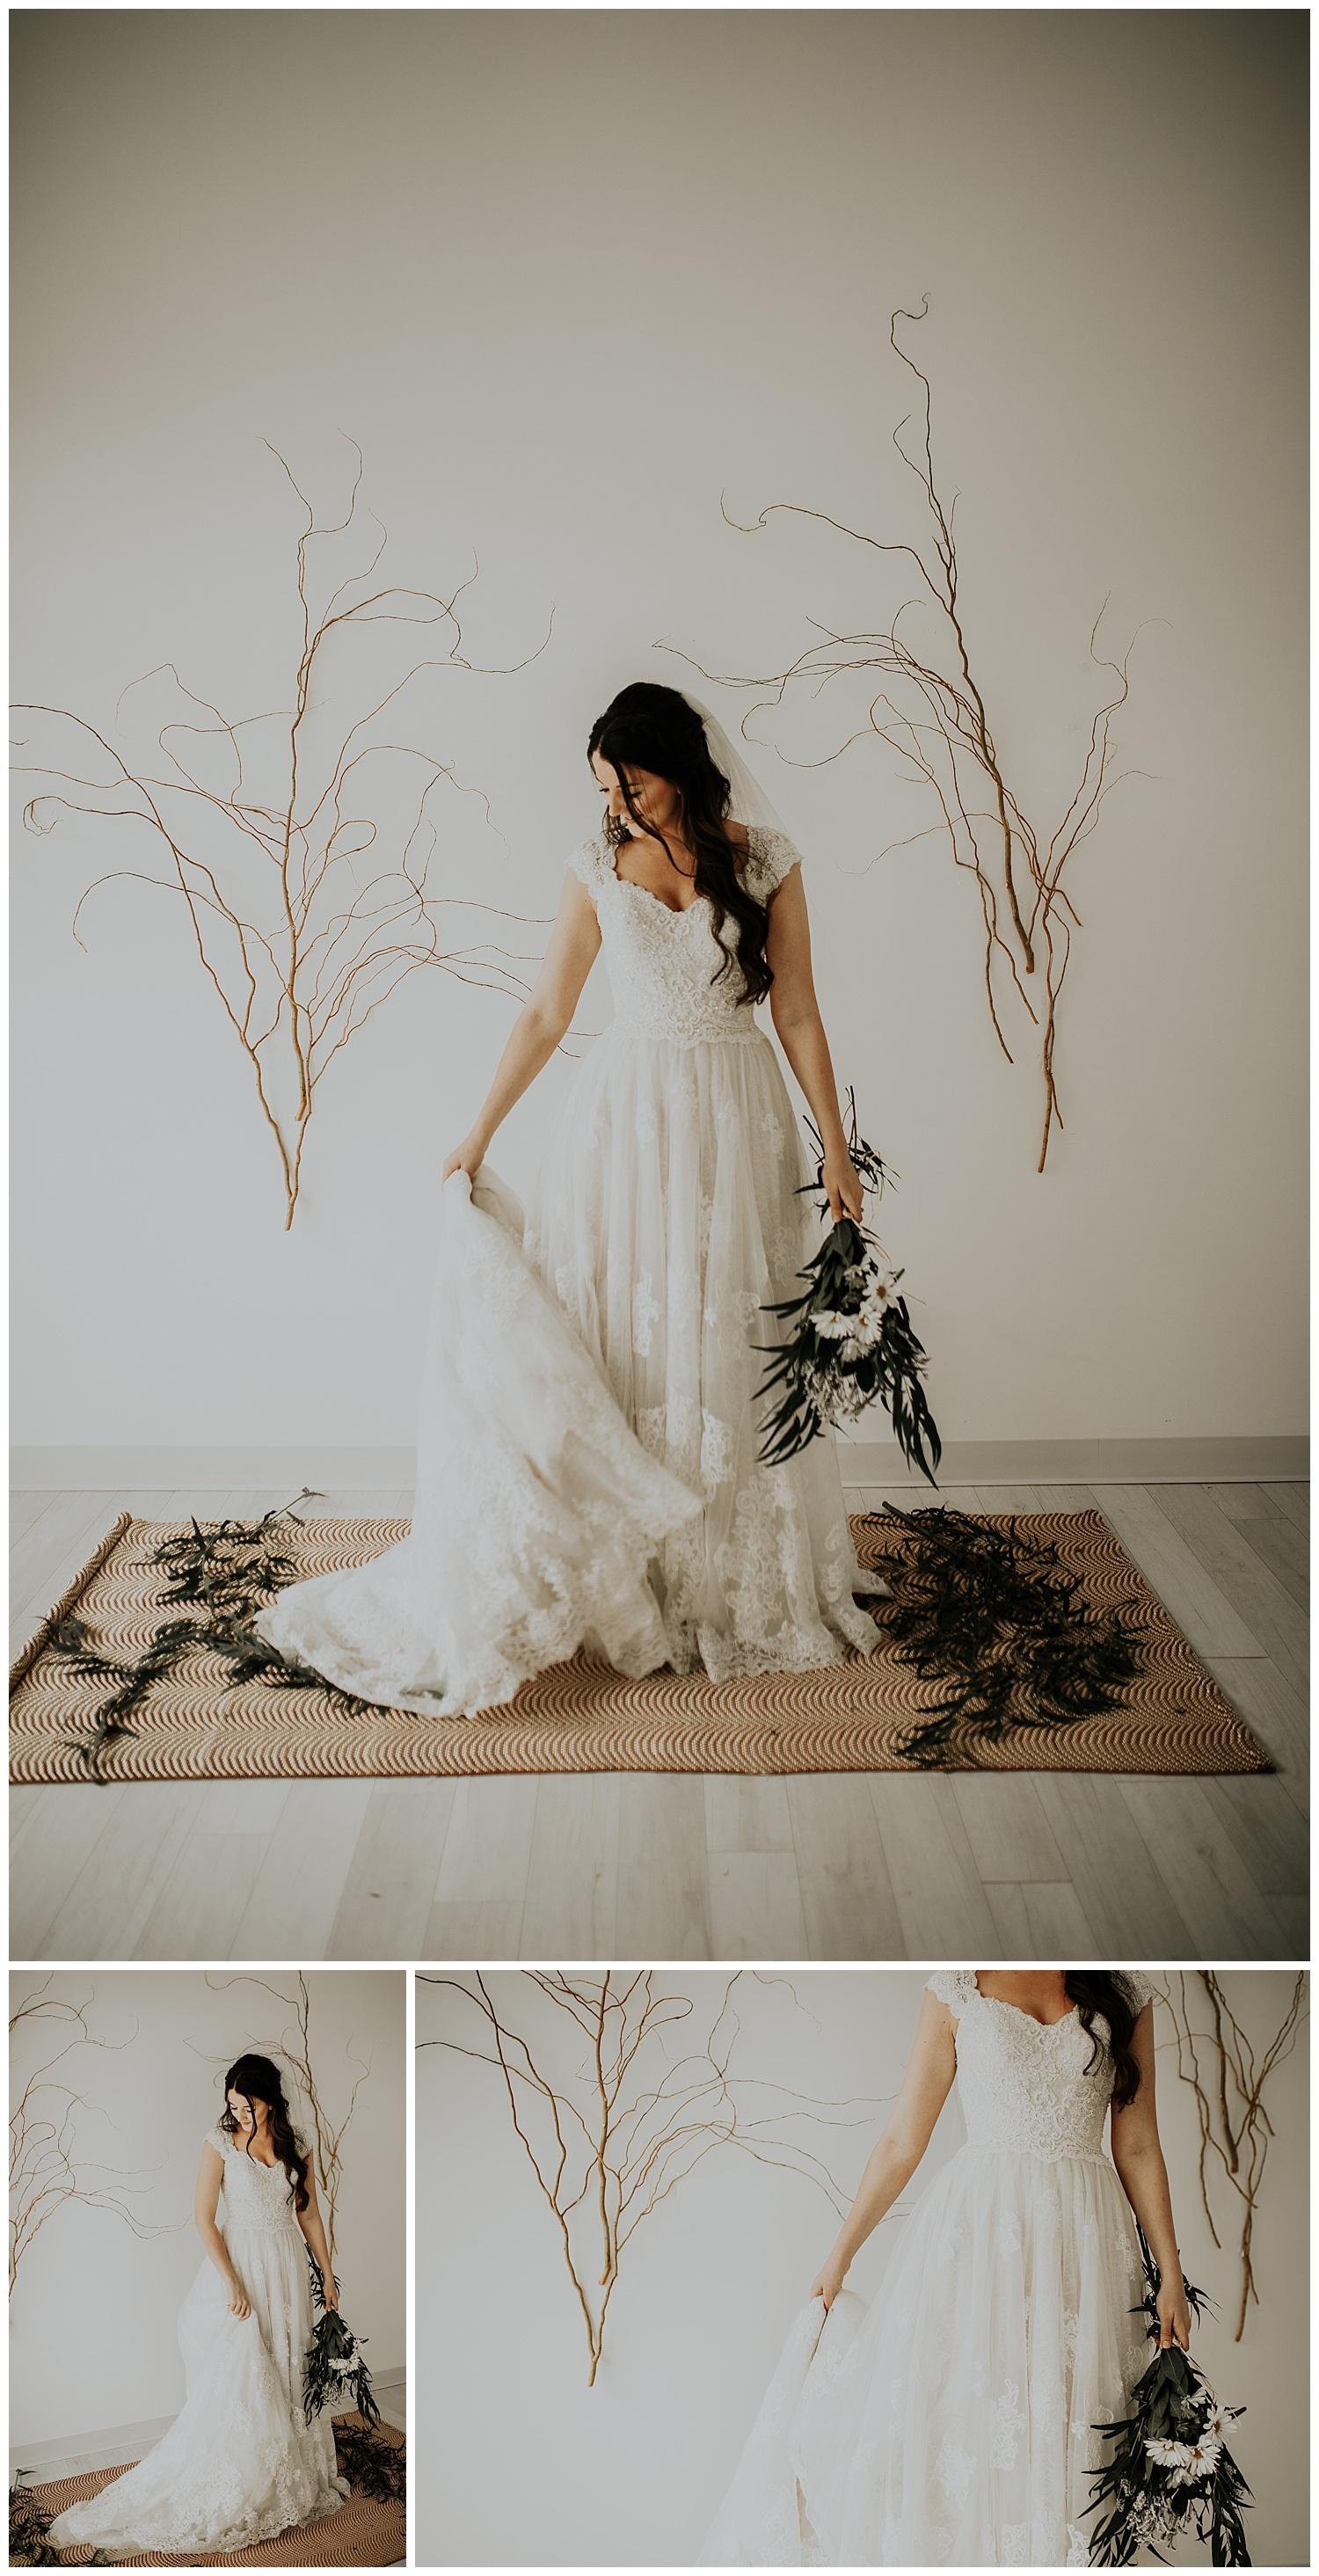 Laken-Mackenzie-Photography-Lumen-Room-Fort-Worth-Bridal-Session-Fort-Worth-Photographer04.jpg